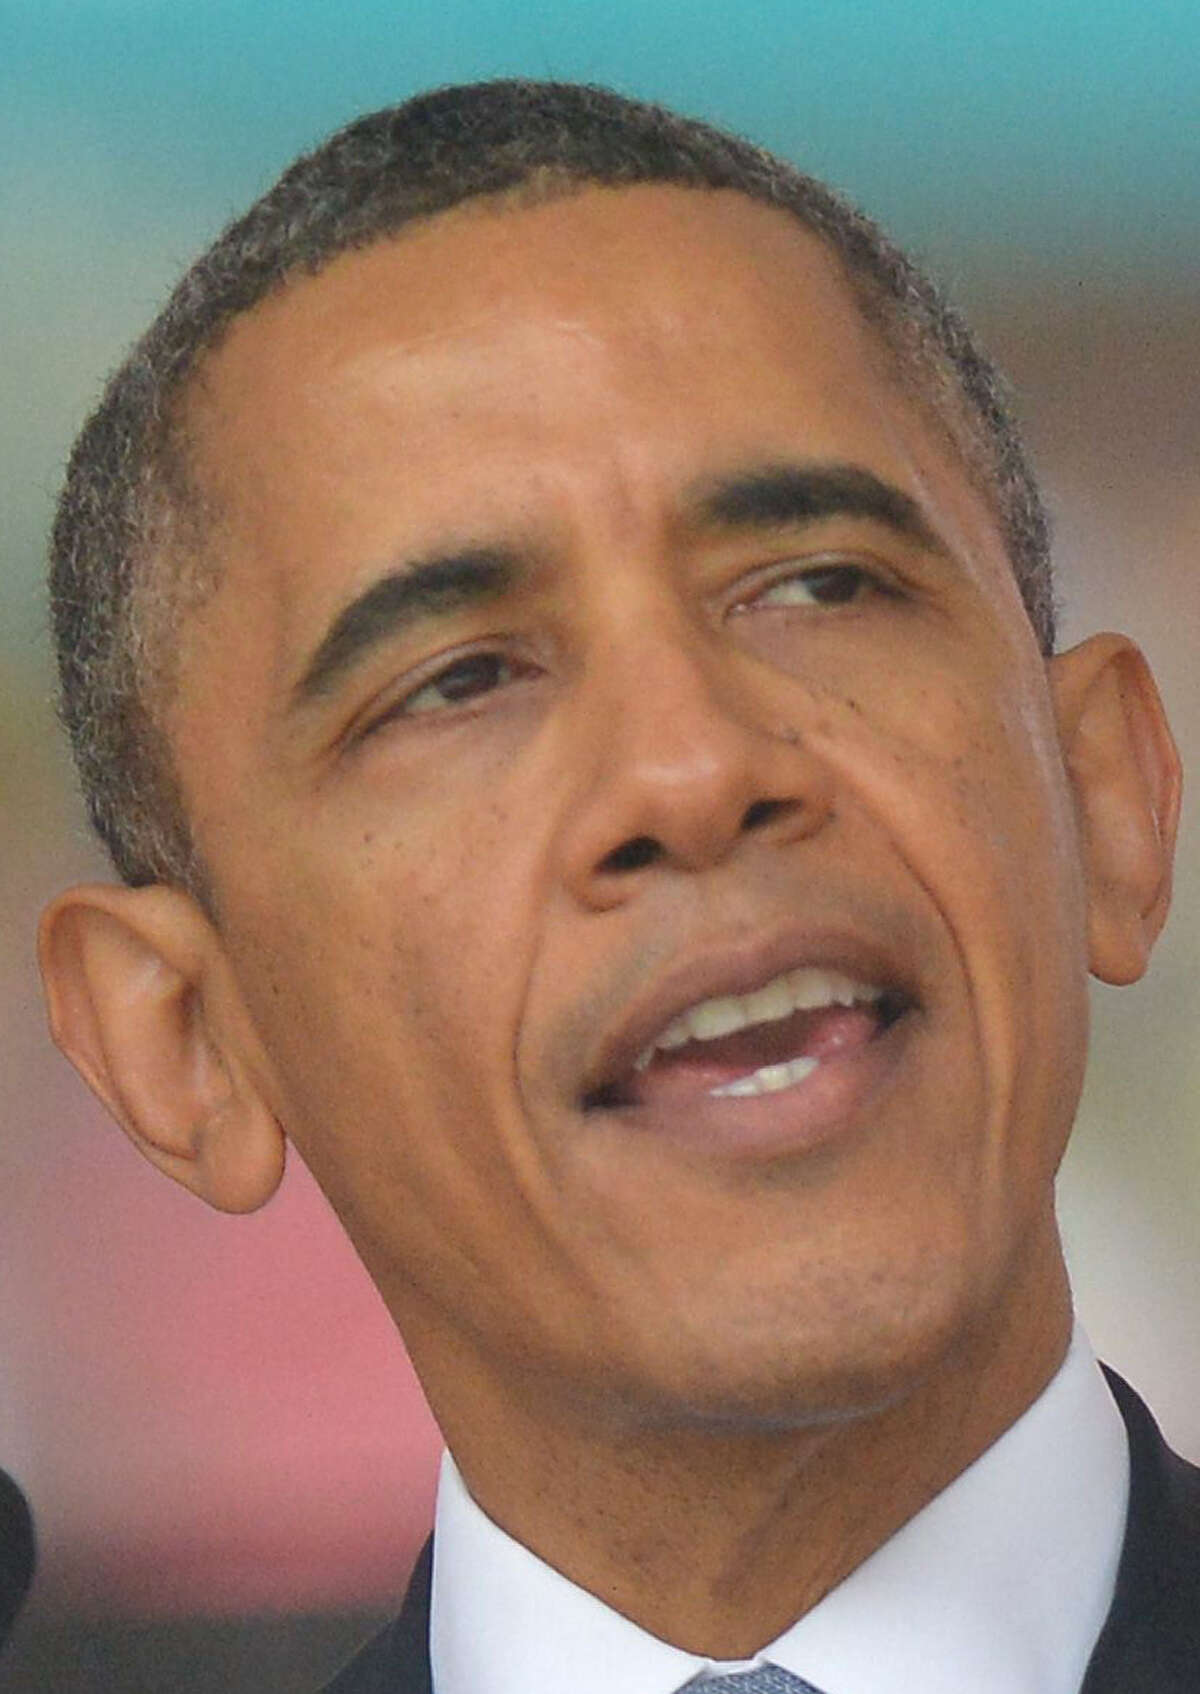 More Americans question President Barack Obama's honesty.